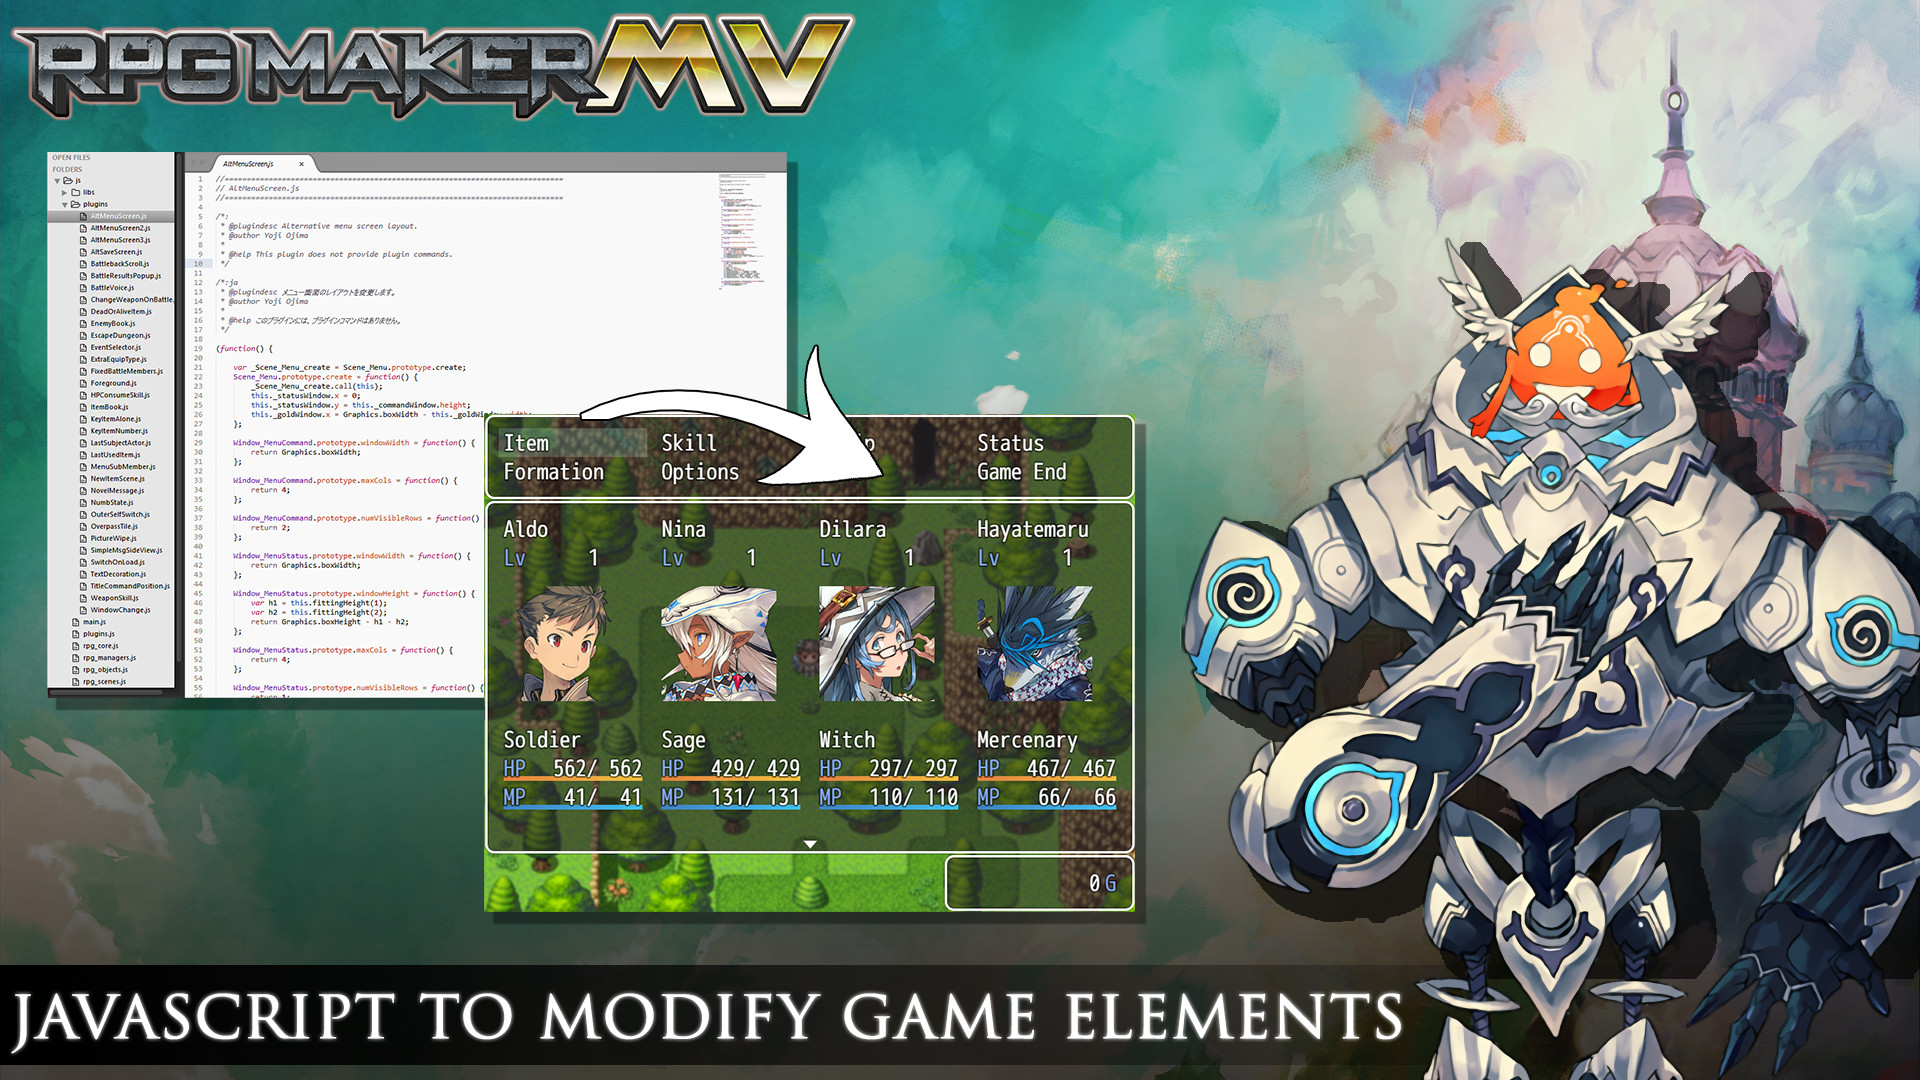 Javascript to modify game elements image - RPG Maker MV - Mod DB